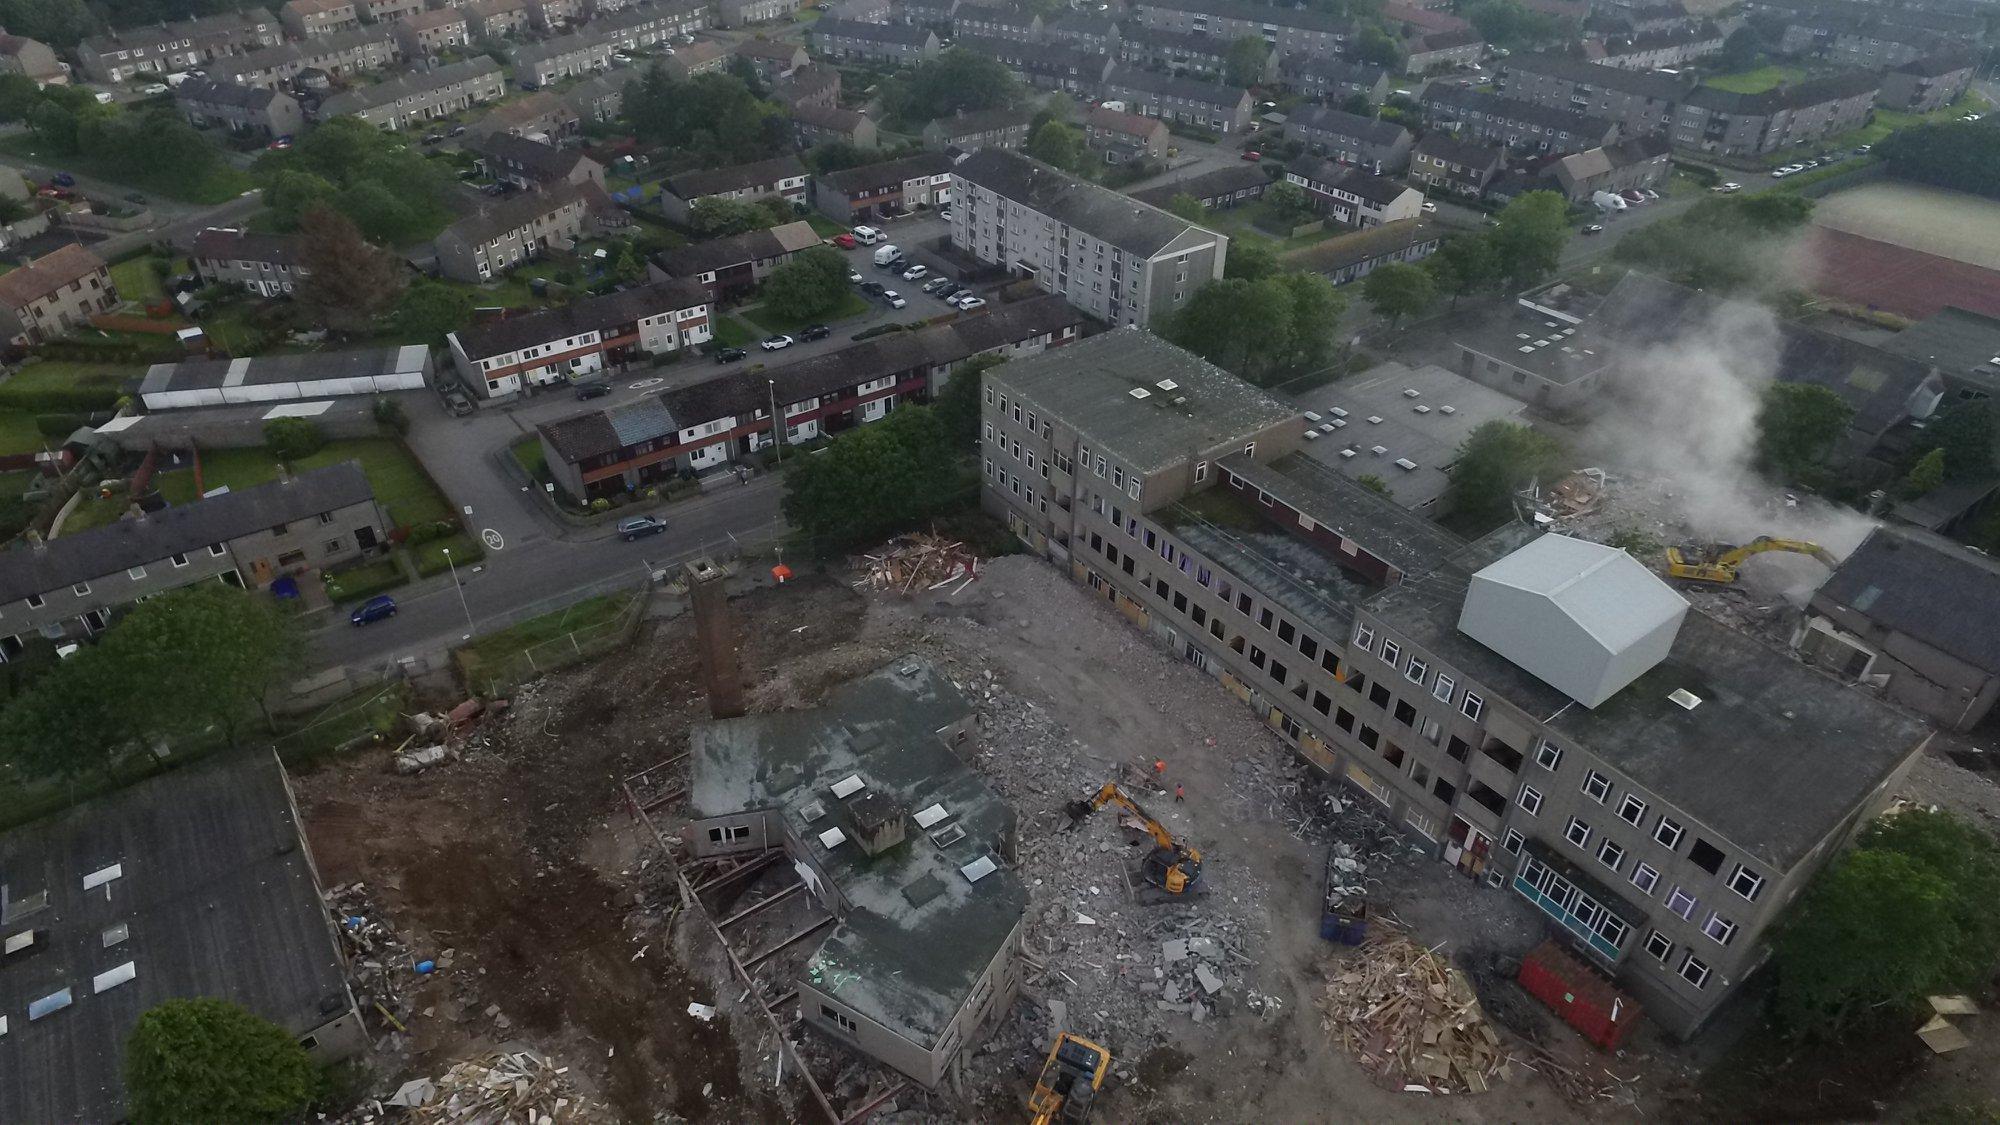 Bird's eye view of the school demolition.